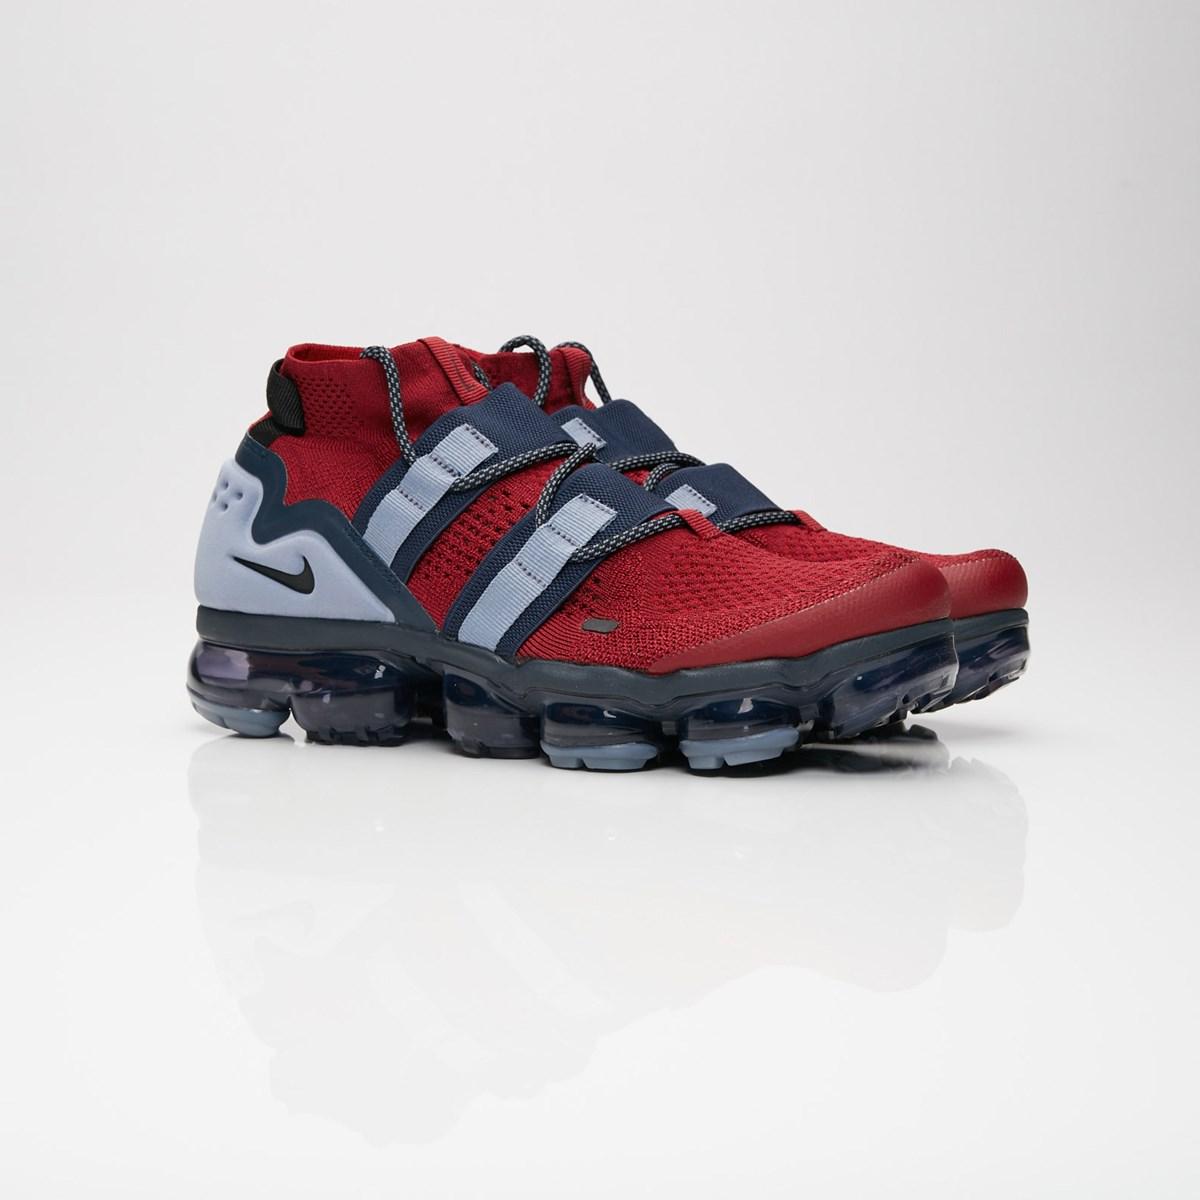 7c174c26356 Nike Air Vapormax FK Utility - Ah6834-600 - Sneakersnstuff ...